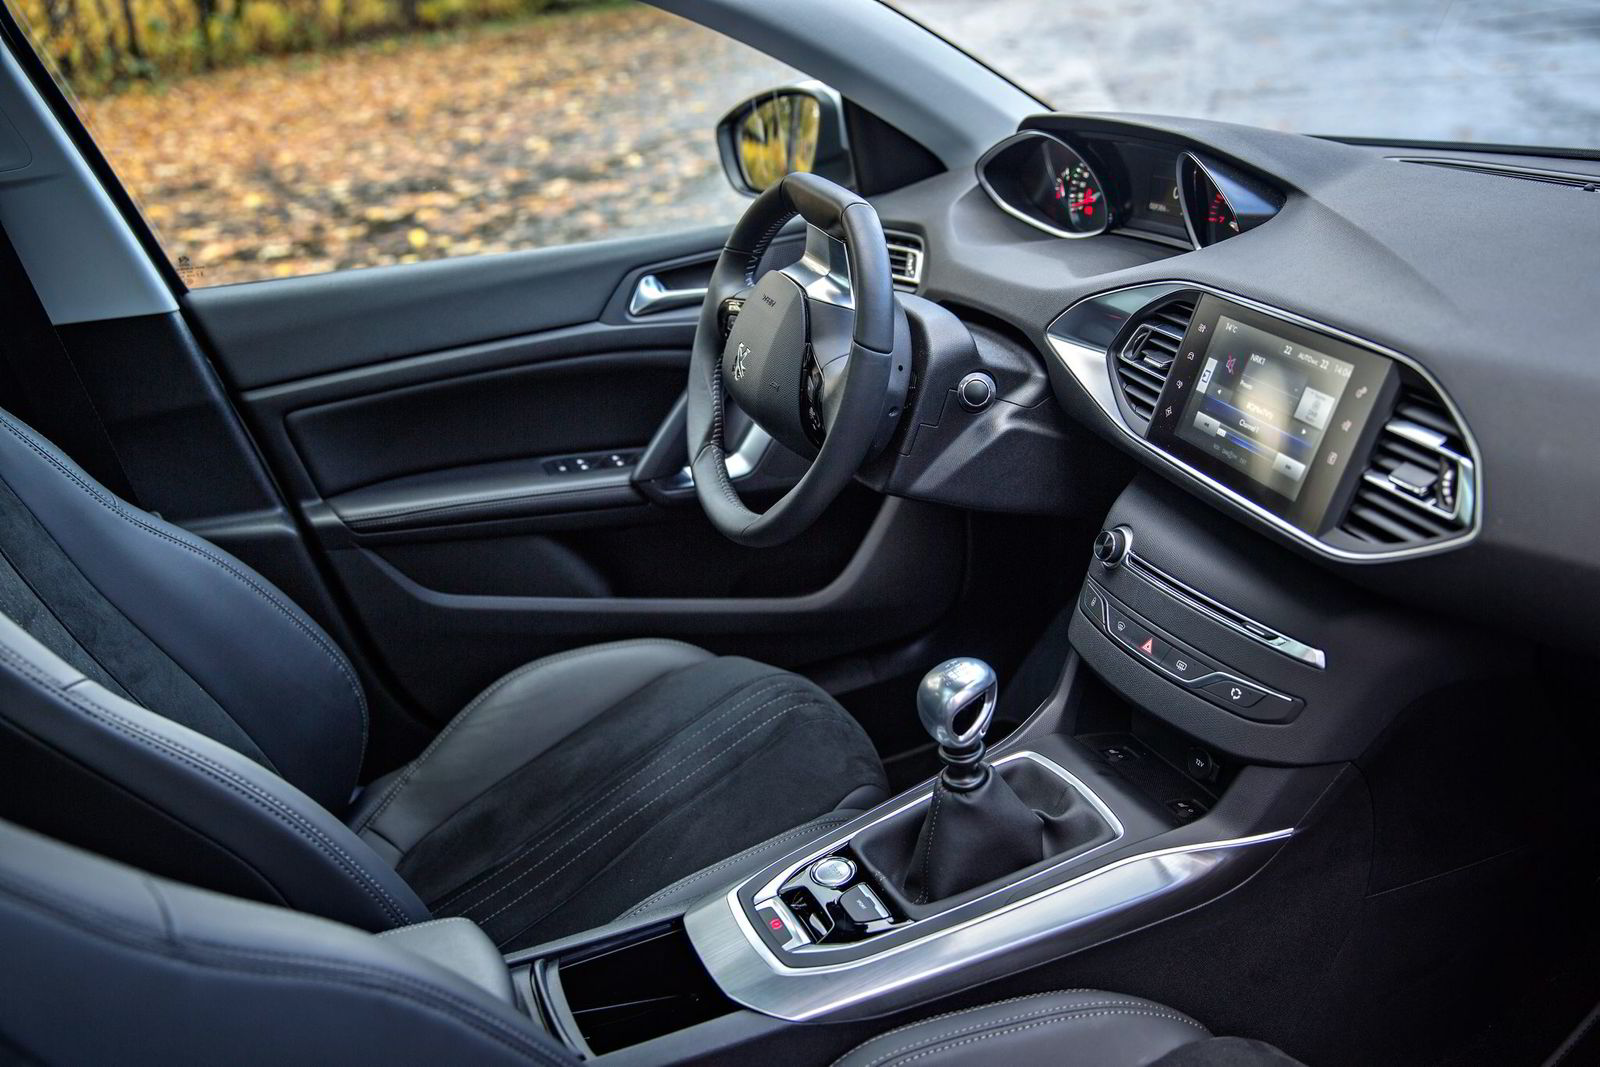 INTERIØR. Peugeot 308 stiller med det klart mest moderne interiøret. Det meste styres via en skjerm i midtkonsollen.